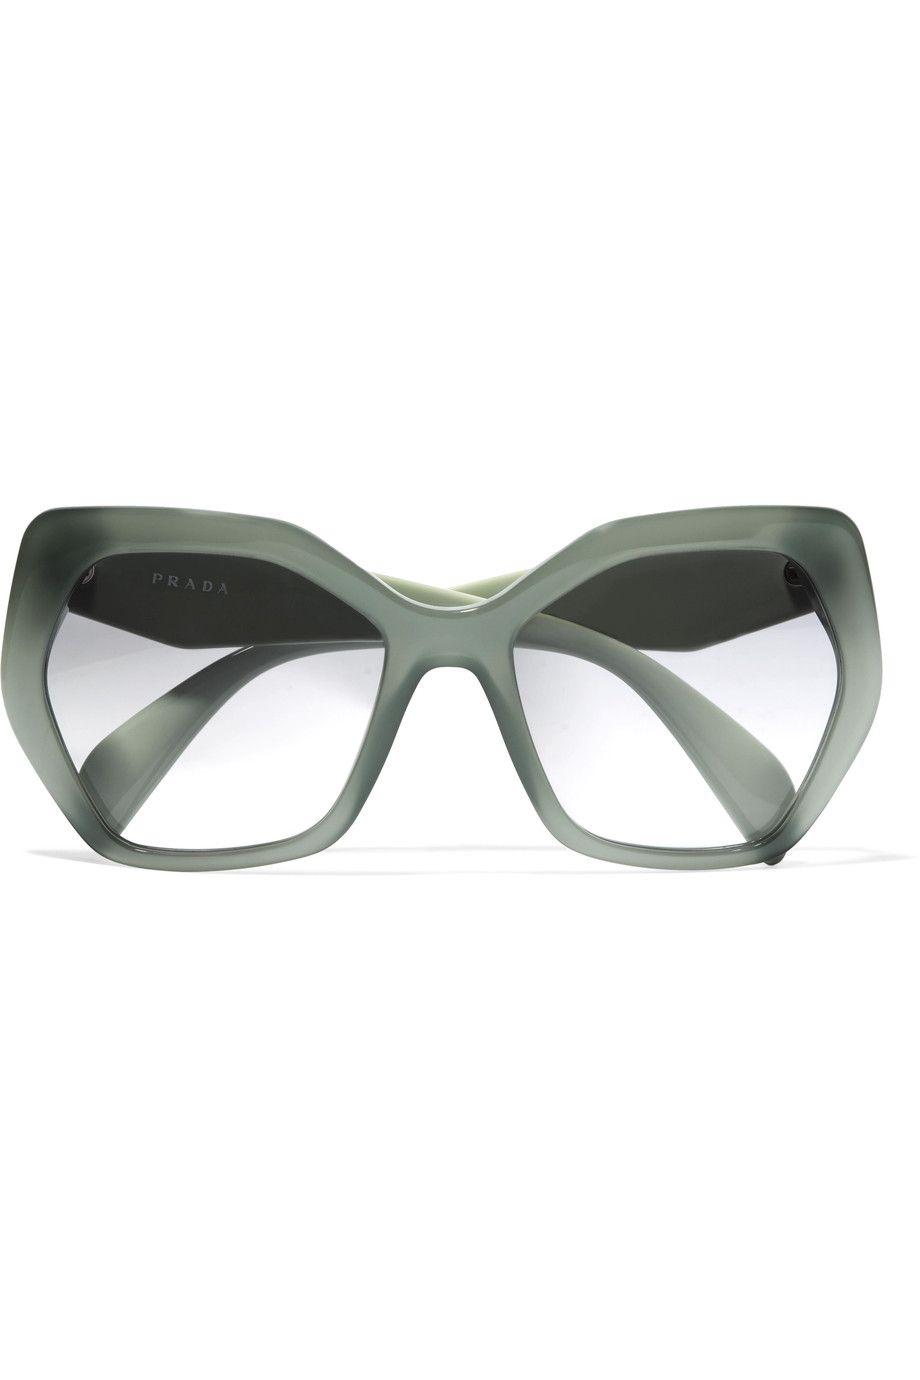 e9ff1c23f06e Shop on-sale Prada Square-frame acetate sunglasses. Browse other discount  designer Sunglasses & more on The Most Fashionable Fashion Outlet, THE  OUTNET.COM